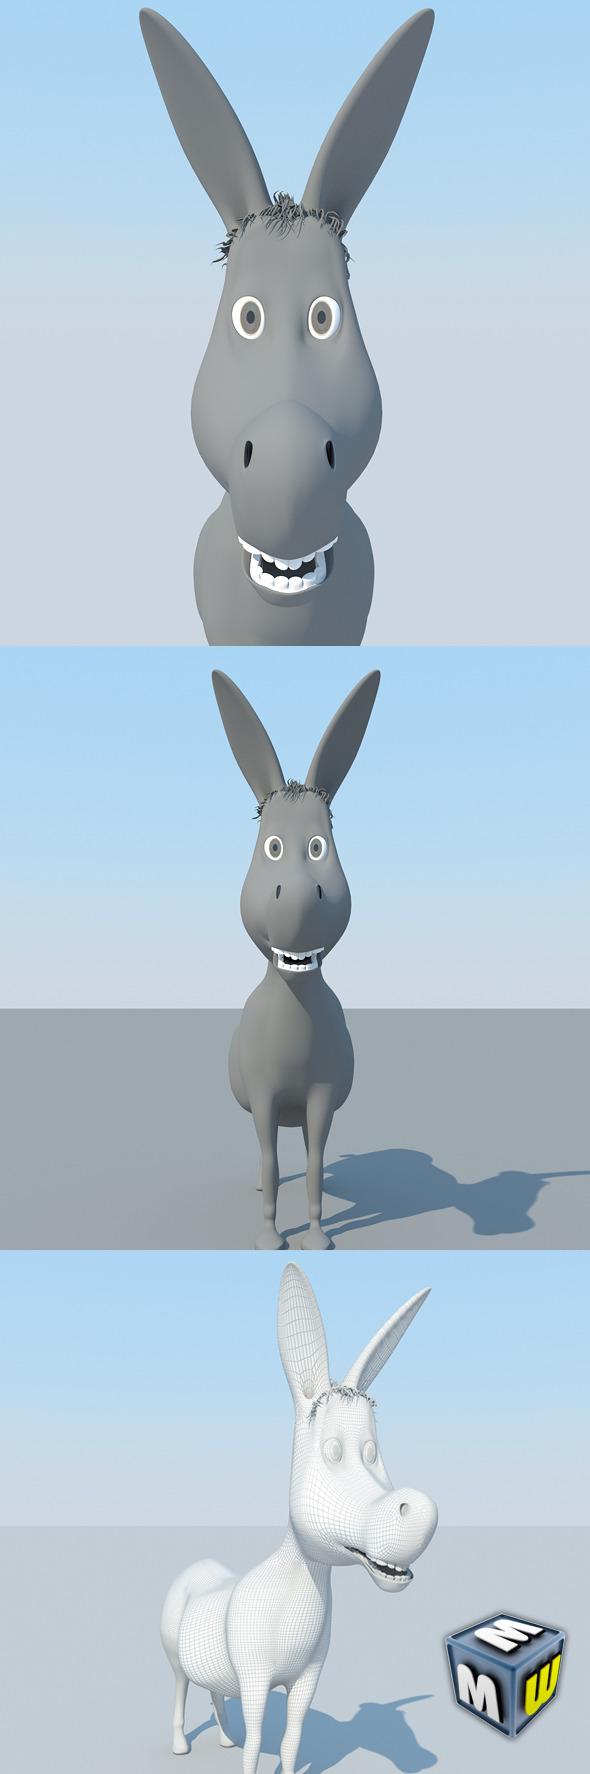 Donkey Cartoon MAX 2011 - 3DOcean Item for Sale